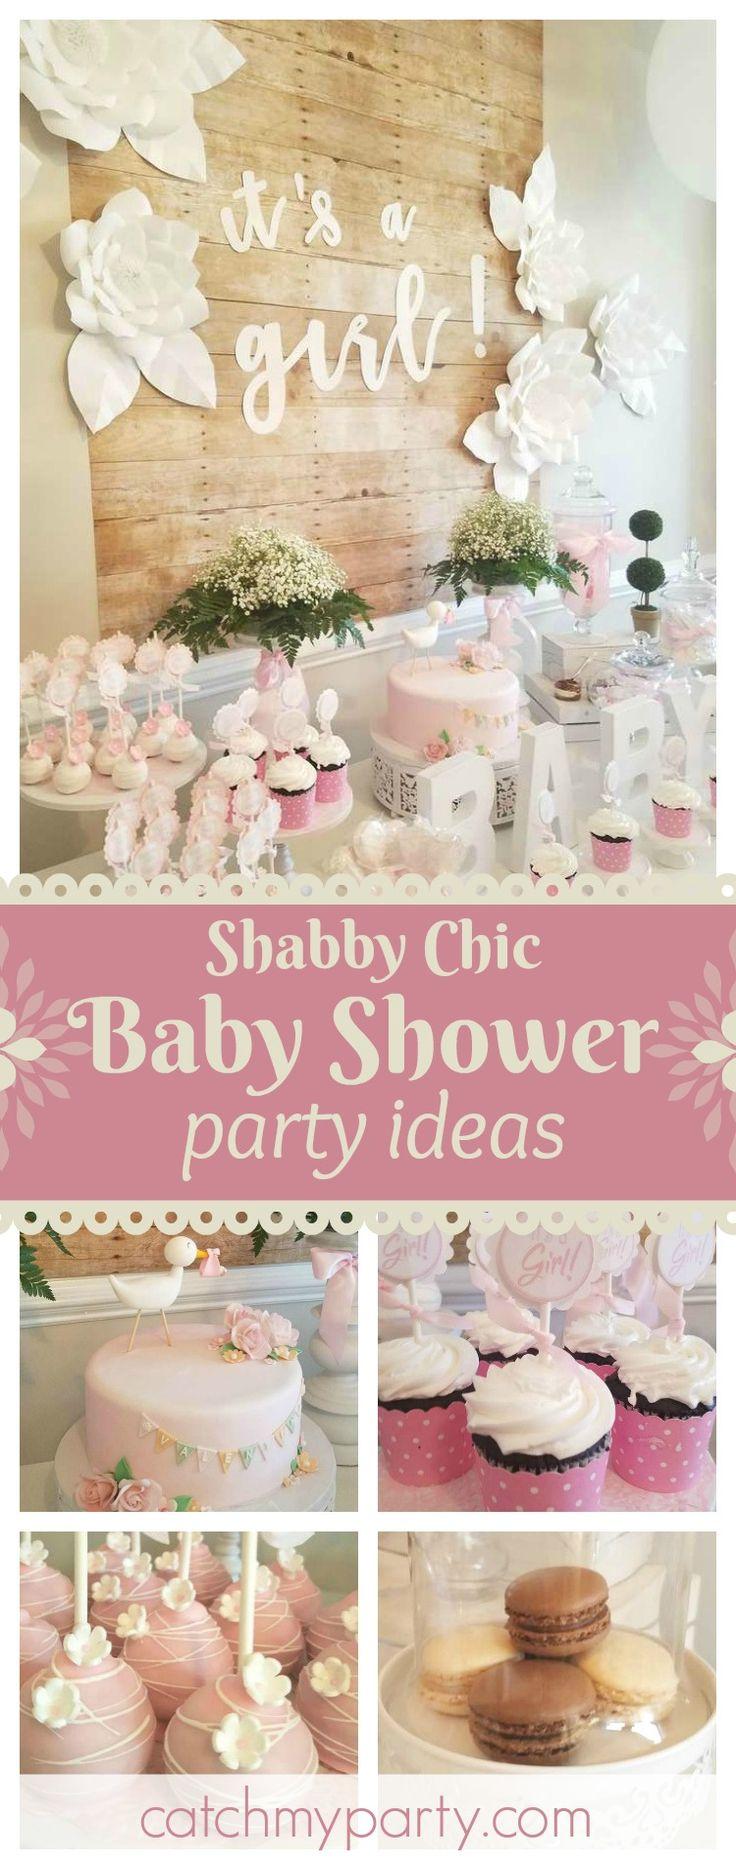 Best 25+ Shabby chic baby shower ideas on Pinterest   Baby ...